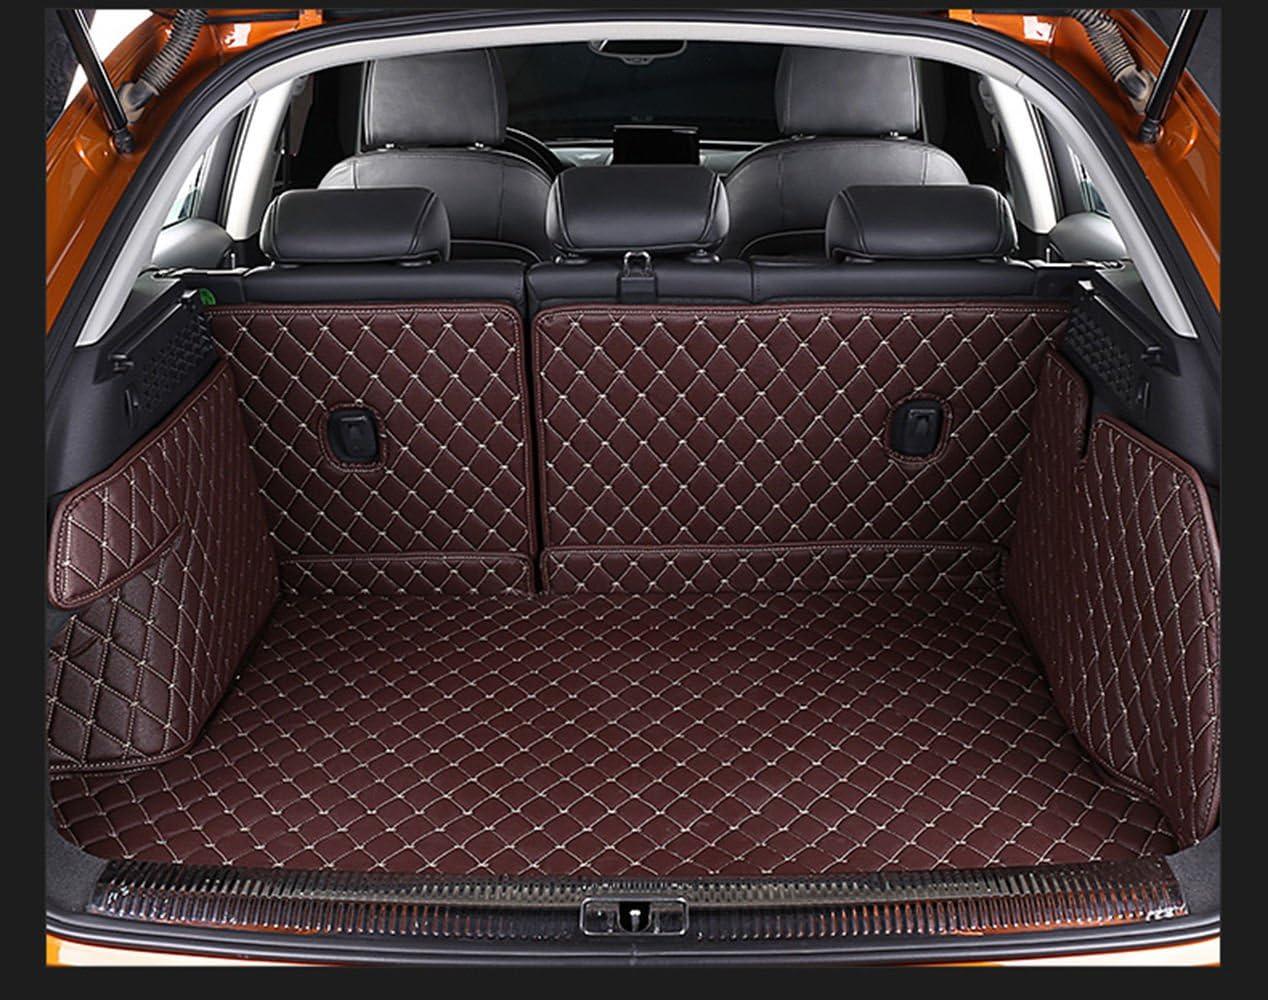 Pegasuss 3D Full Coverage Waterproof Car Trunk Mat For Porsche Macan-Brown